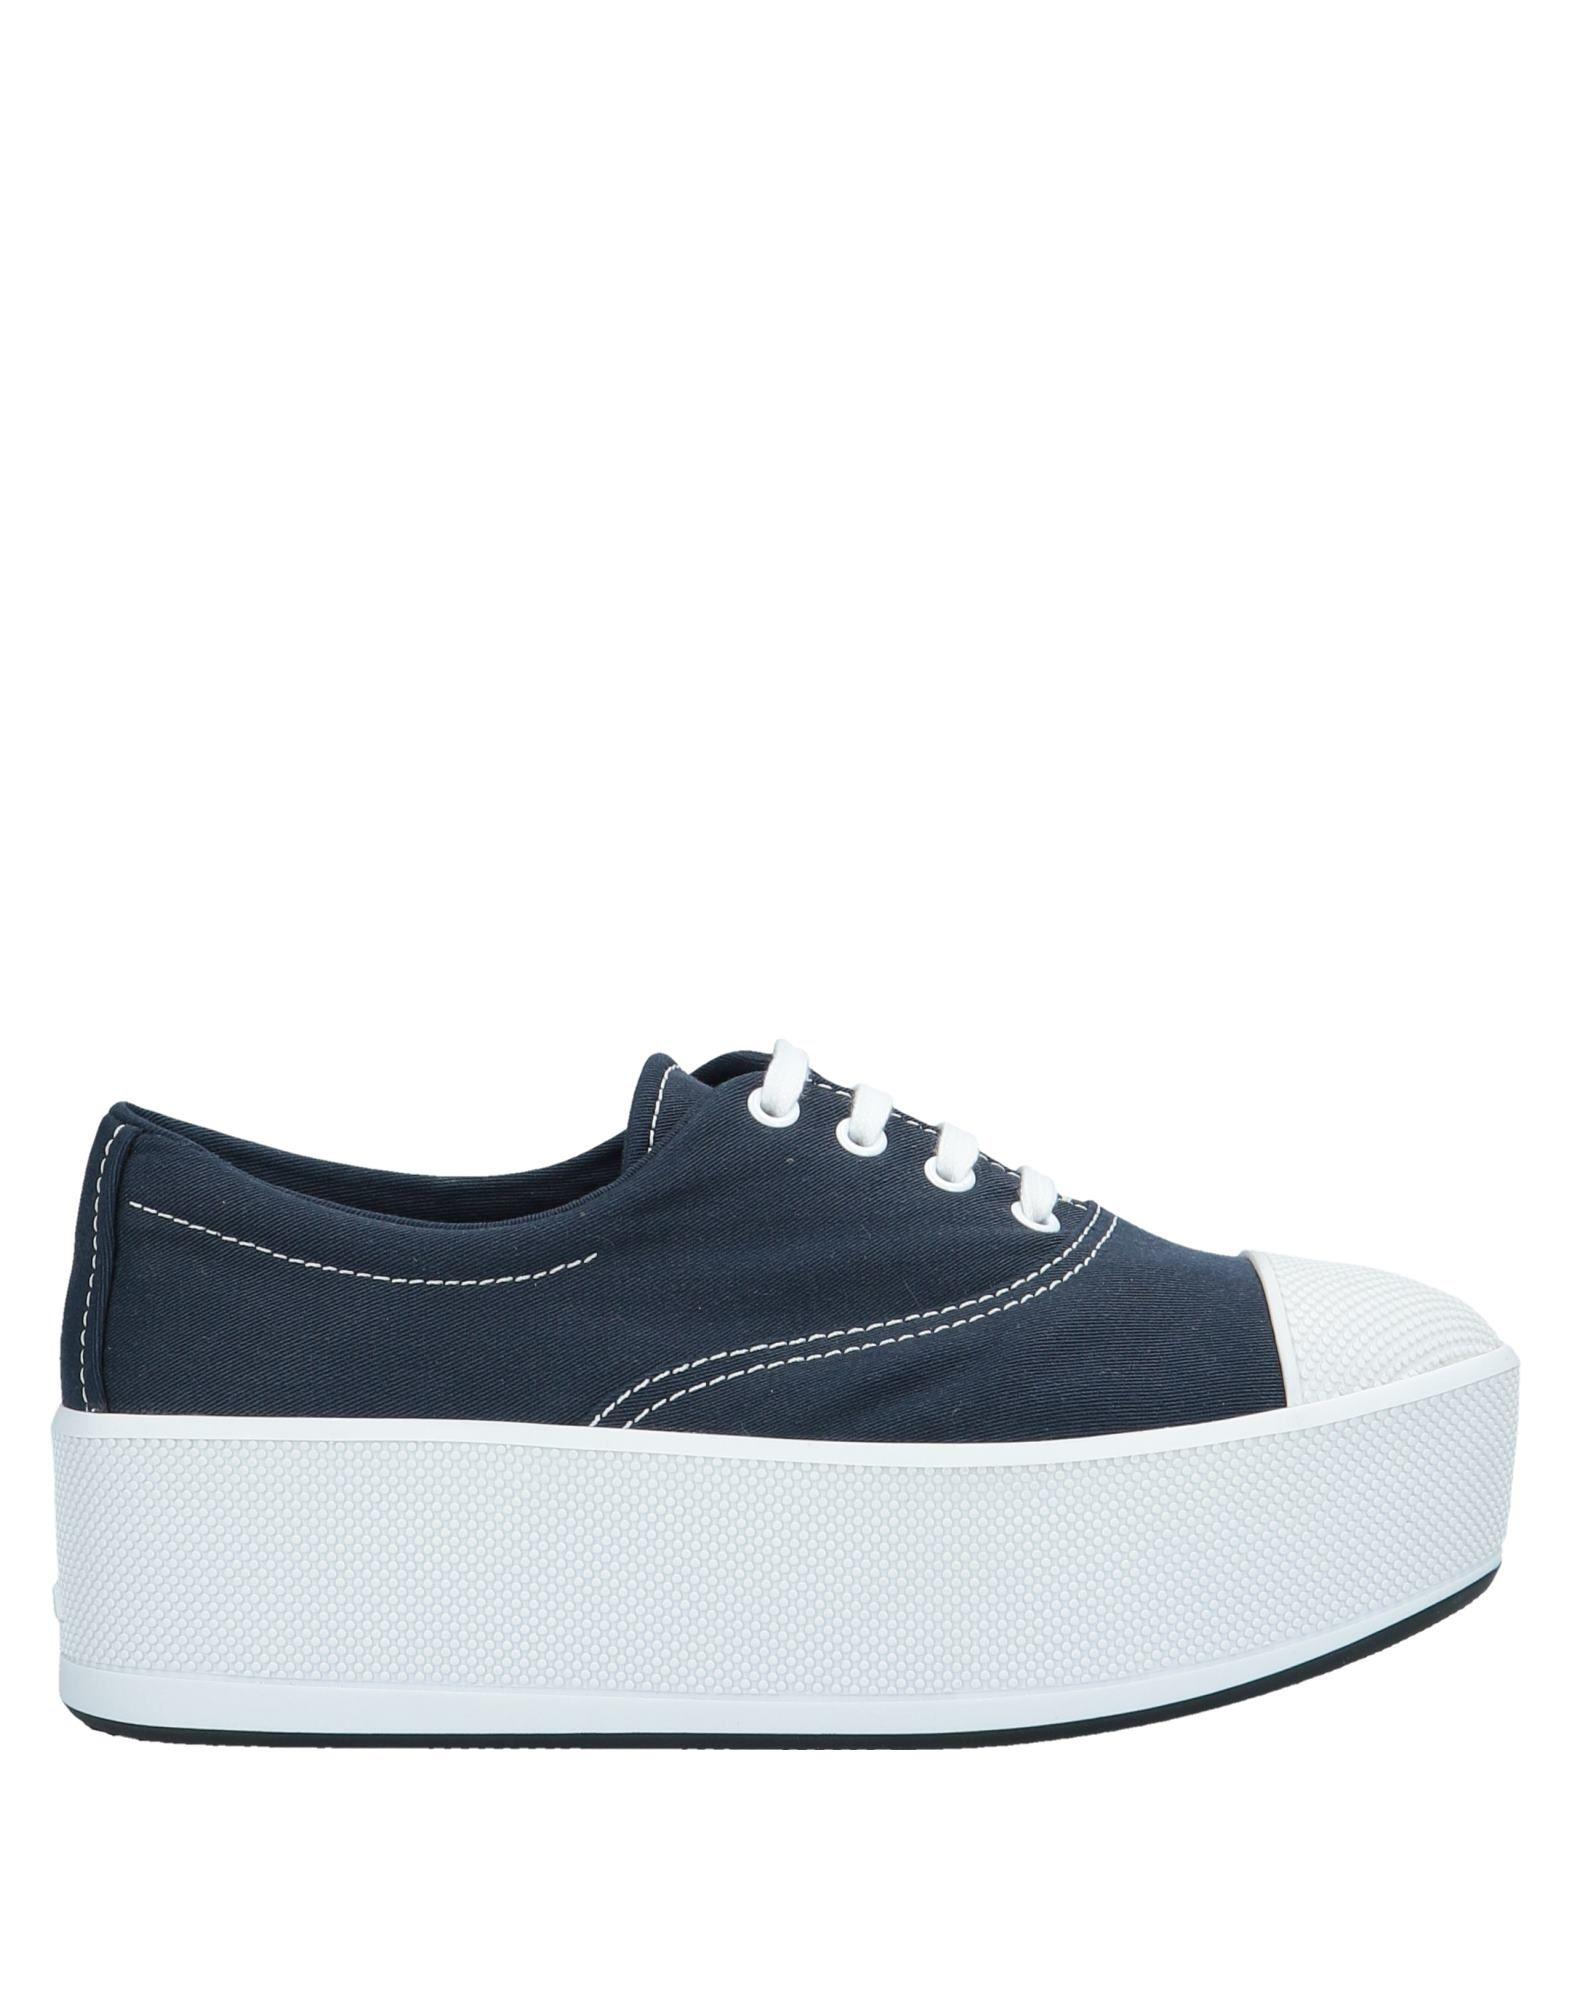 Prada Sport Sneakers - Women Prada Sport Sneakers - online on  Australia - Sneakers 11563654RD ed5d55